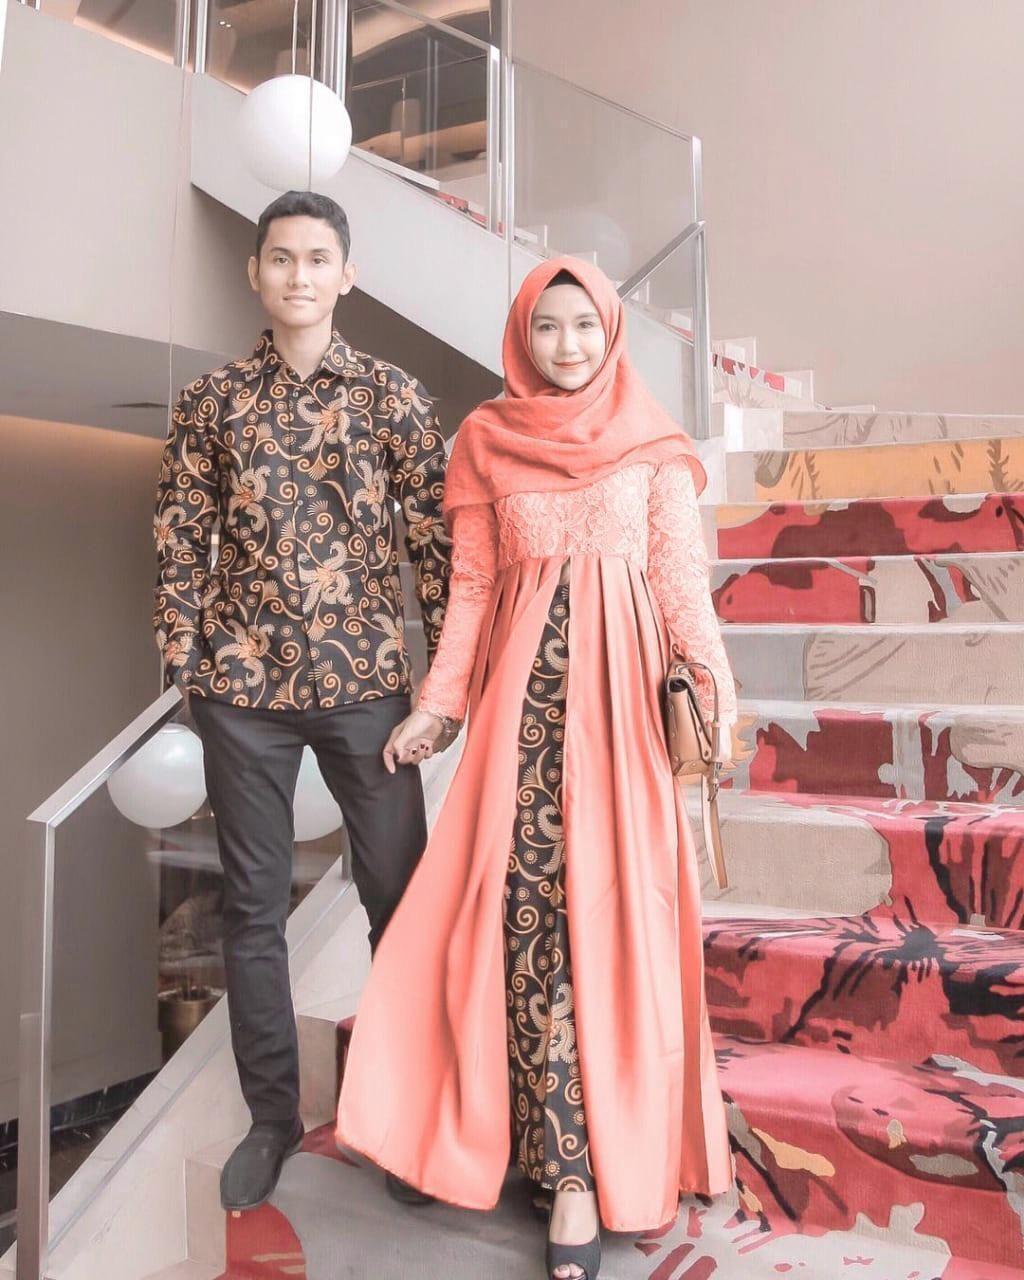 Model Baju Batik Wanita Remaja Terbaru : model, batik, wanita, remaja, terbaru, Model, Gamis, Wanita, Kombinasi, Batik, Fashion,